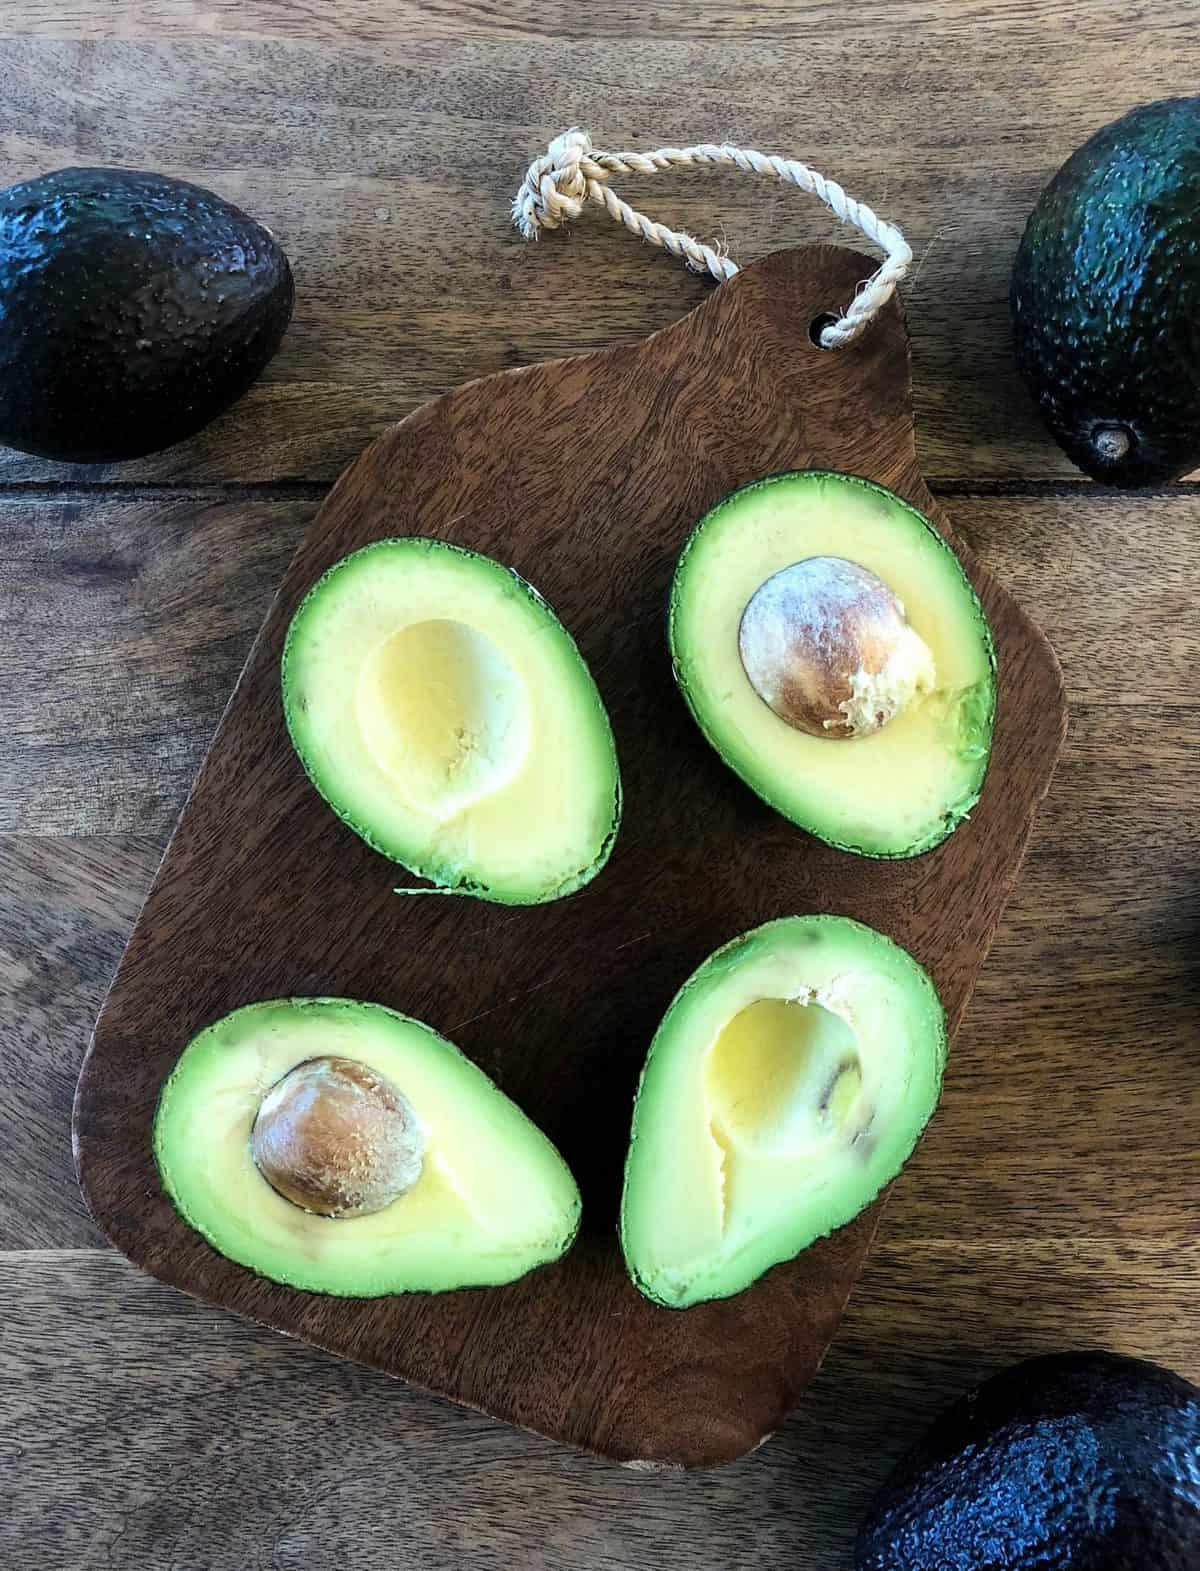 California Avocado Recipes You Haven't Tried, But Should!